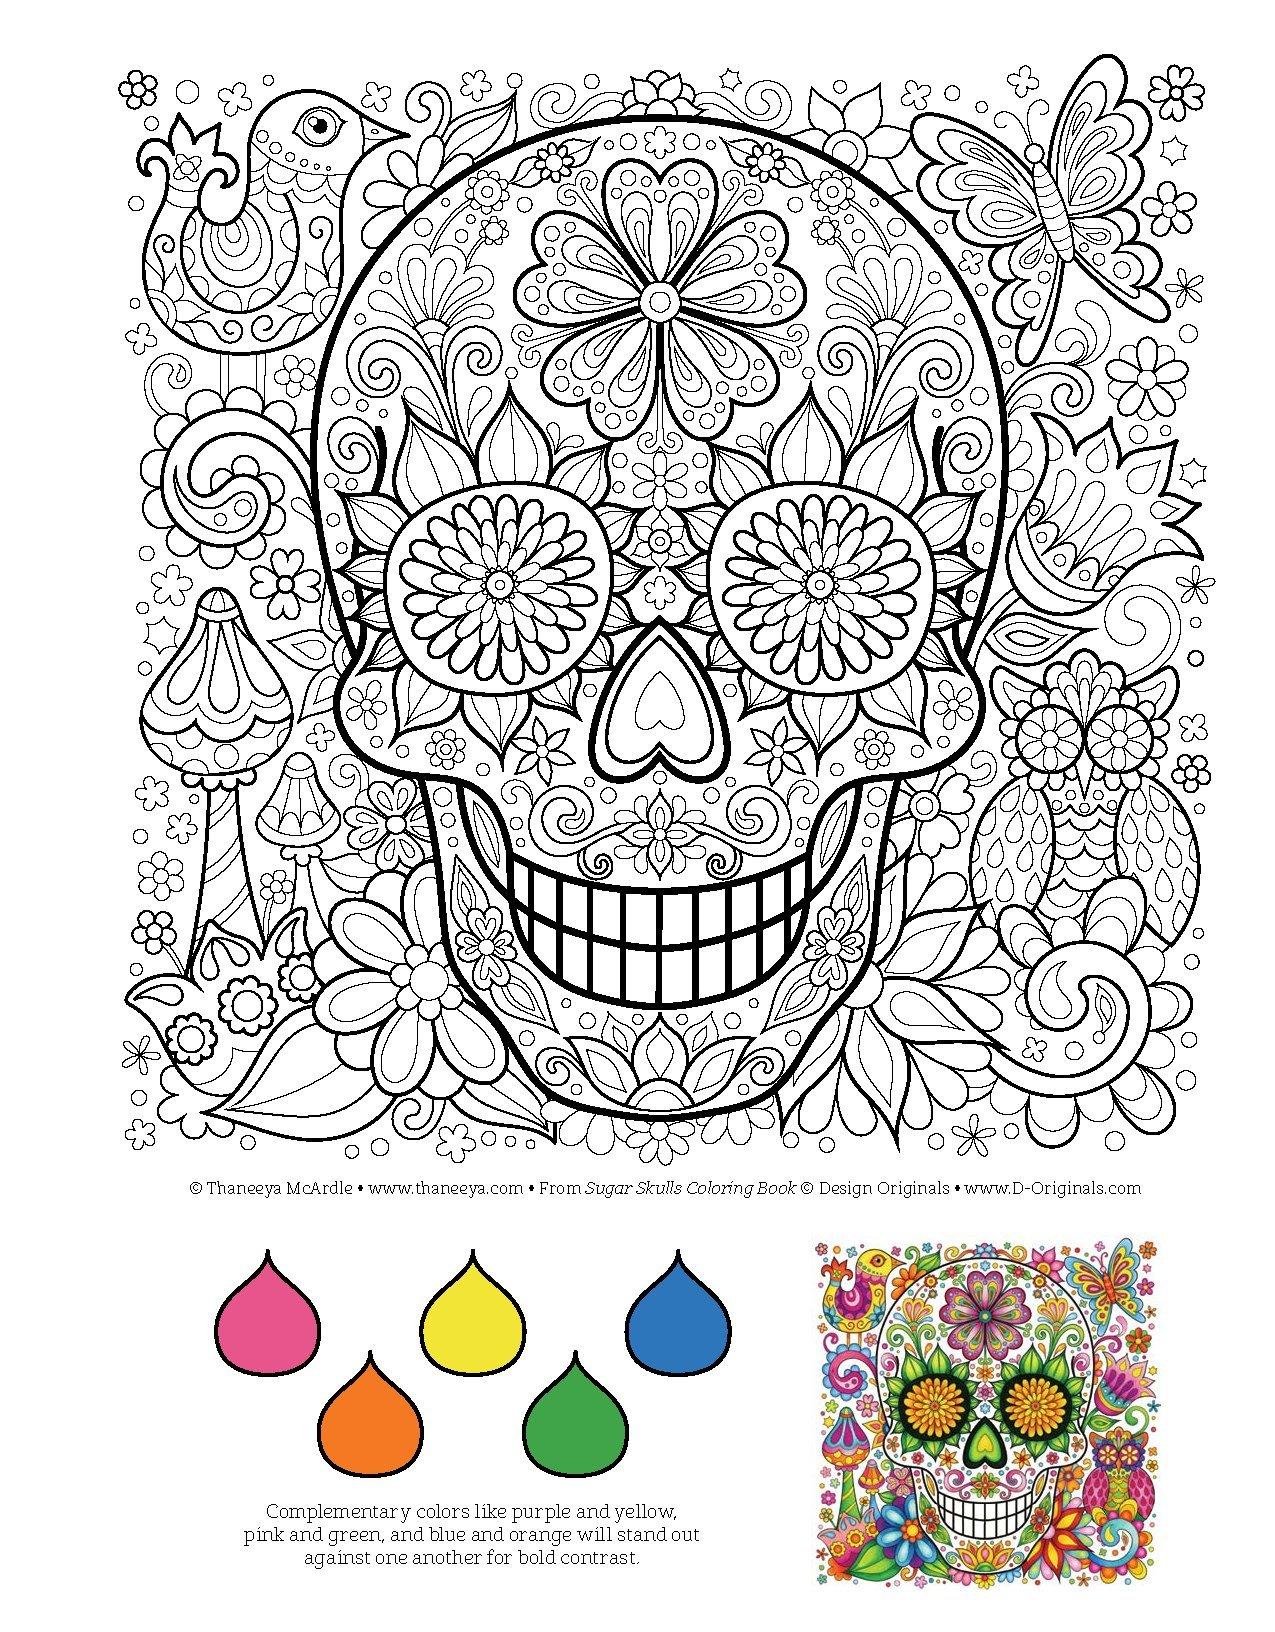 Amazon Sugar Skulls Coloring Book Is Fun Design Originals 9781497202047 Thaneeya McArdle Books